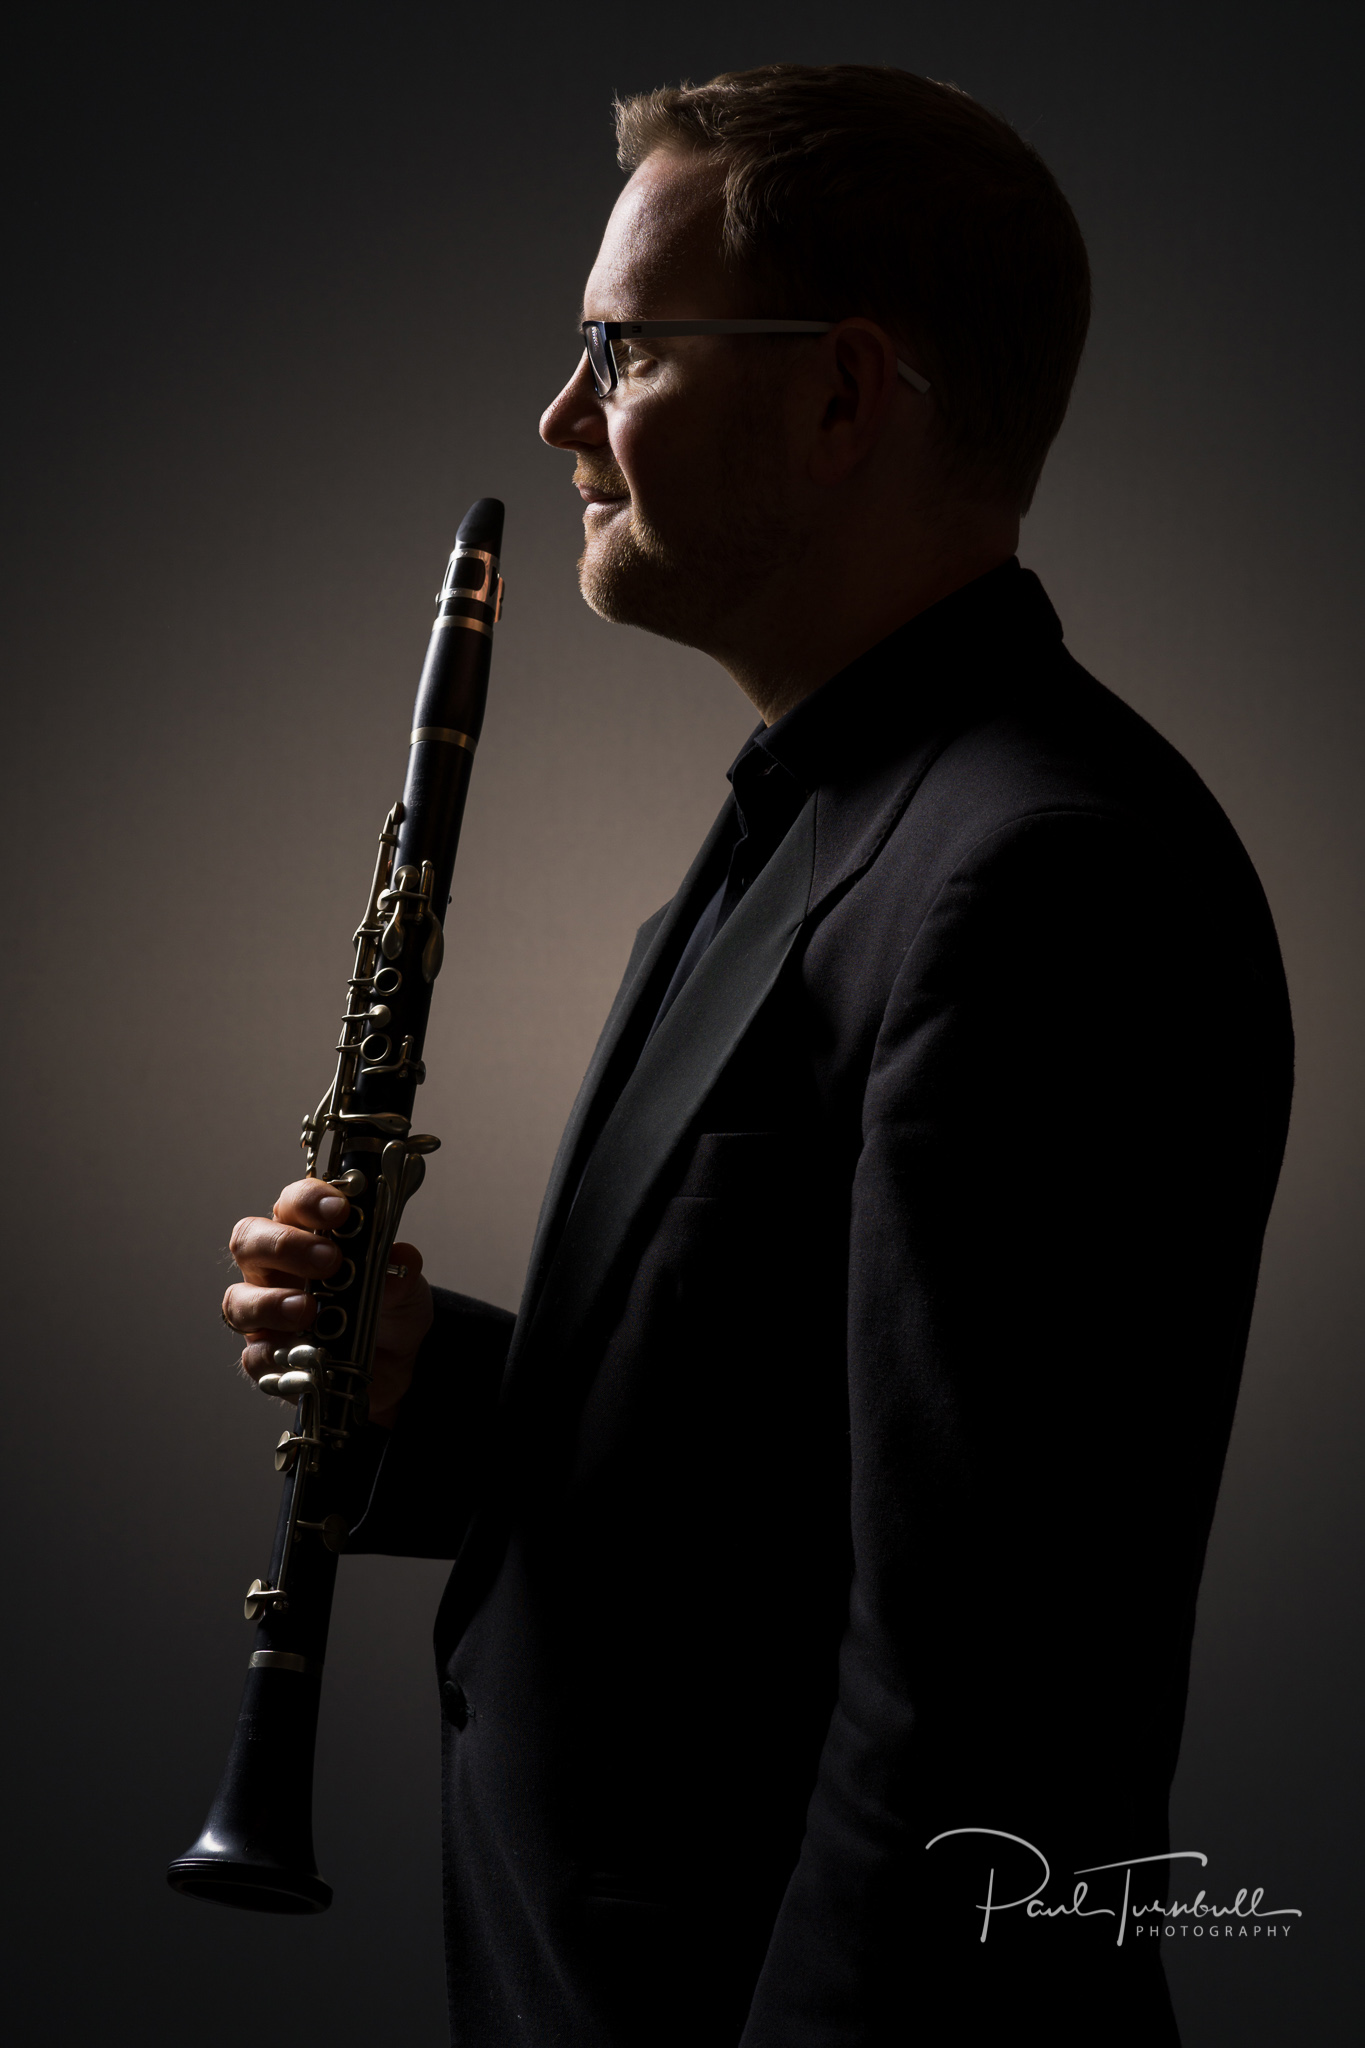 musician-headshot-portrait photographer-leeds-yorkshire-003.jpg